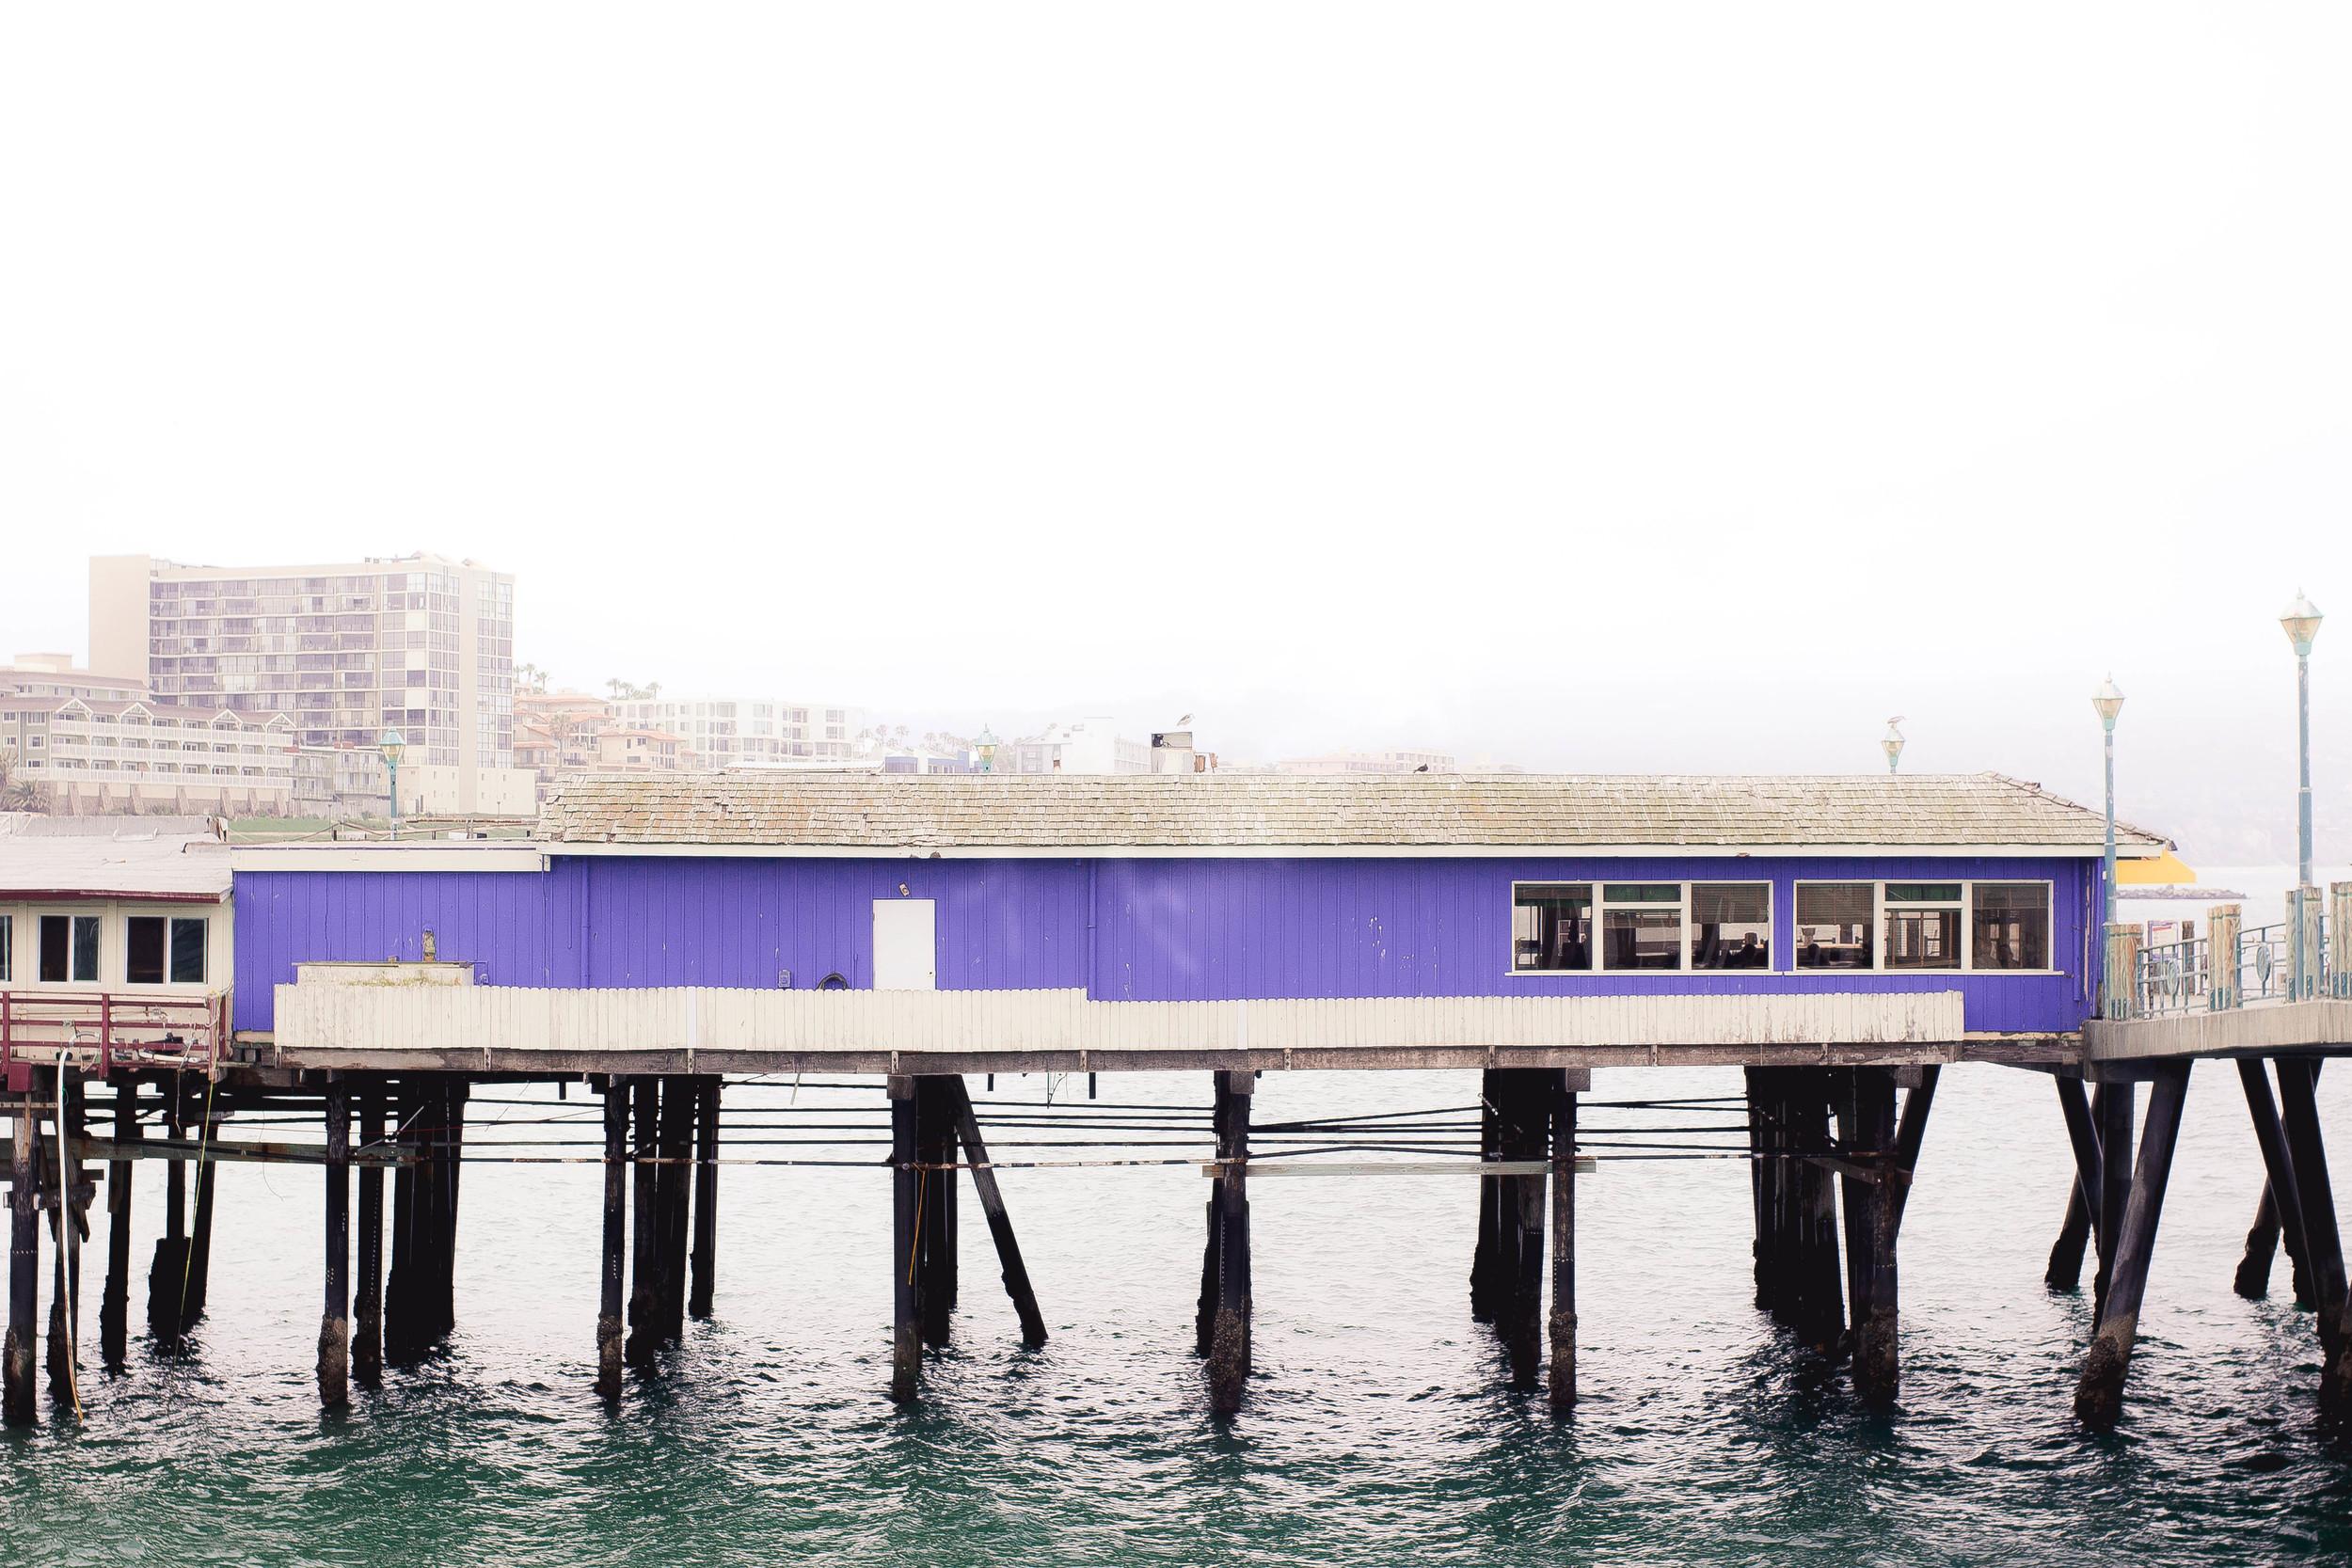 Redondo Beach Pier in fog | from scratch, mostly